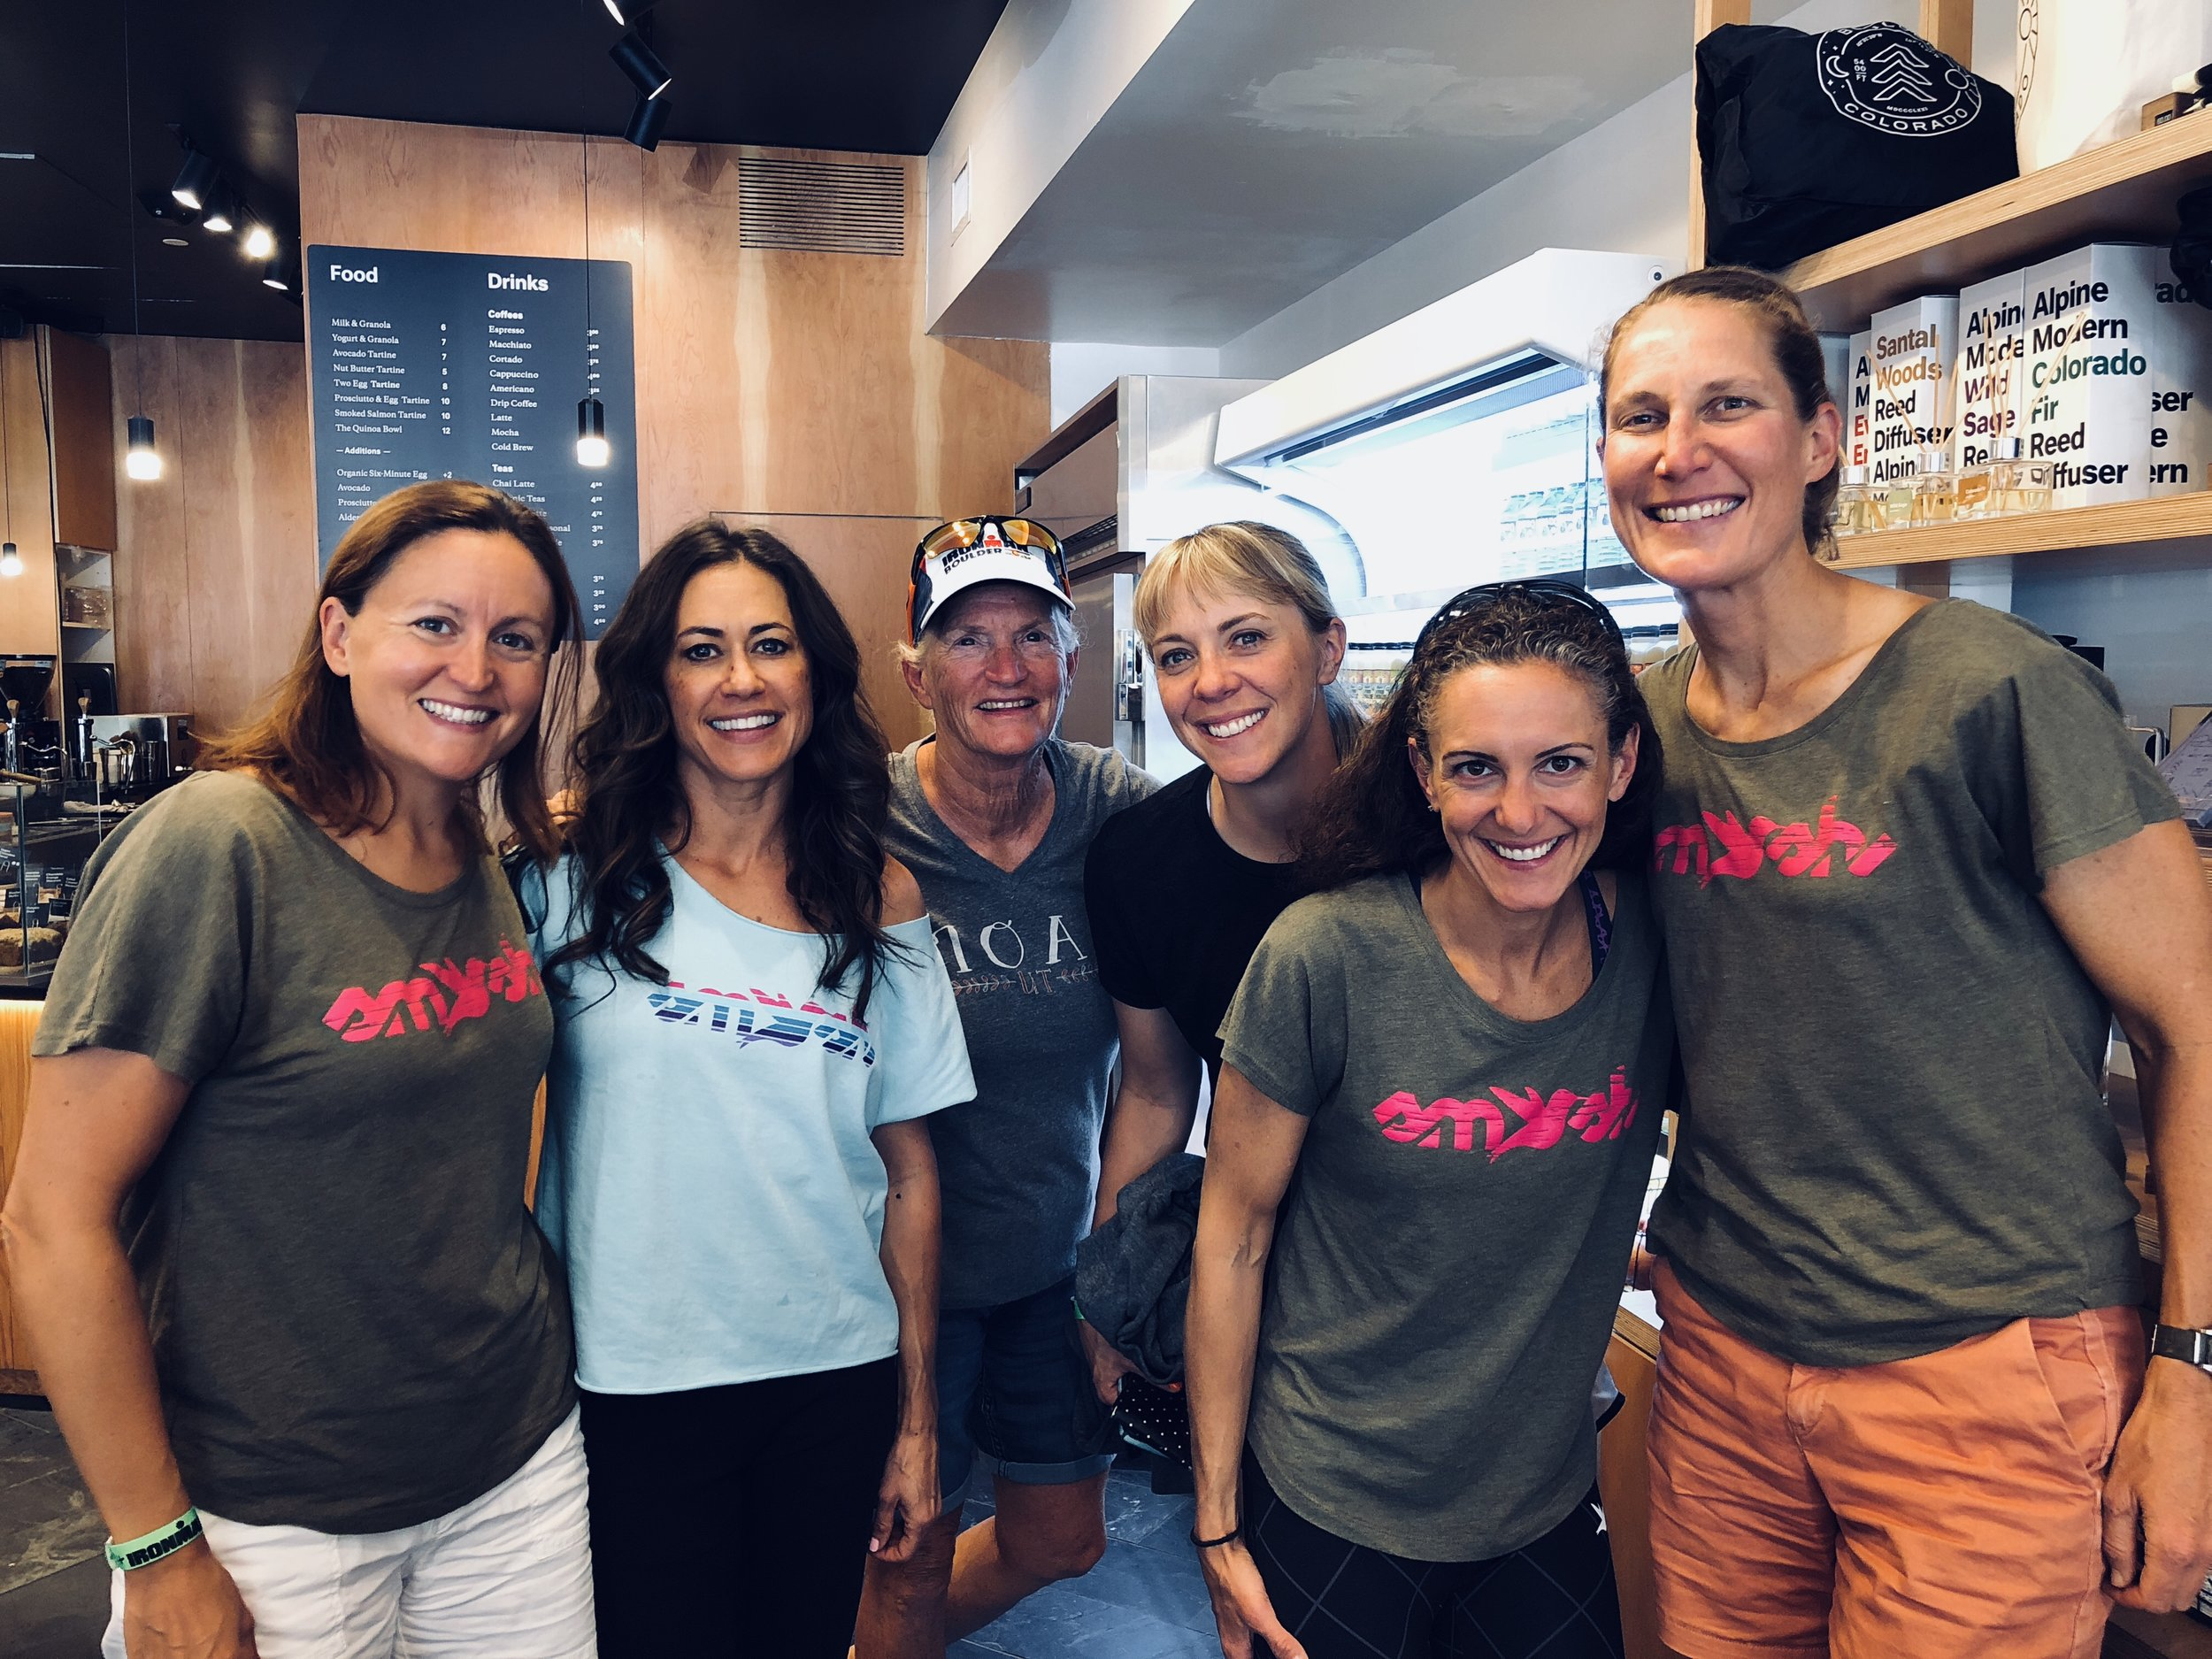 My amazing TeamSFQ teammates, from left: Sarah Peltier, Cortney Haile, Pam Batungbacal, Ashley Wilkinson, Tracy Alexandra, and a CU Alum.